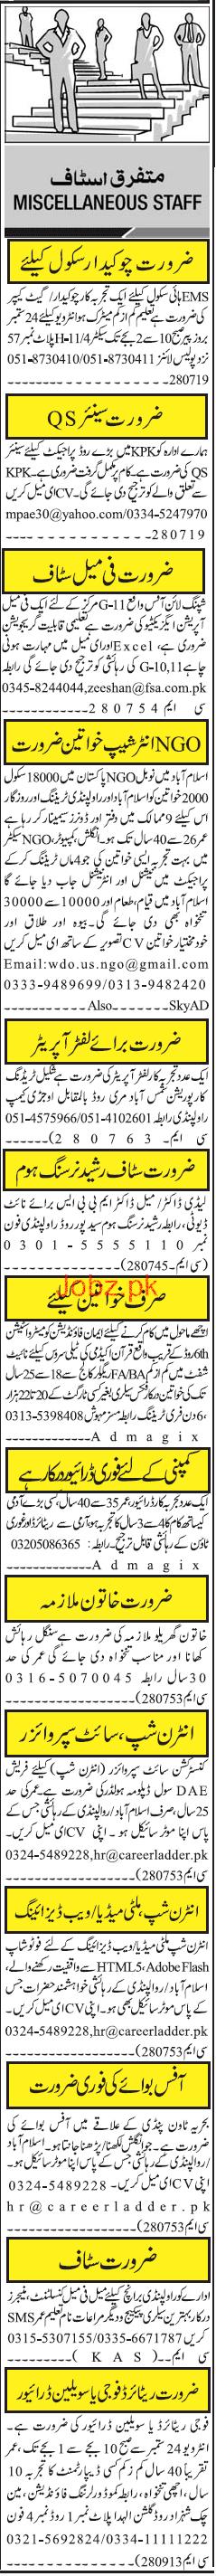 Chawkidar, Gate Keeper, Teachers, Operators Wanted